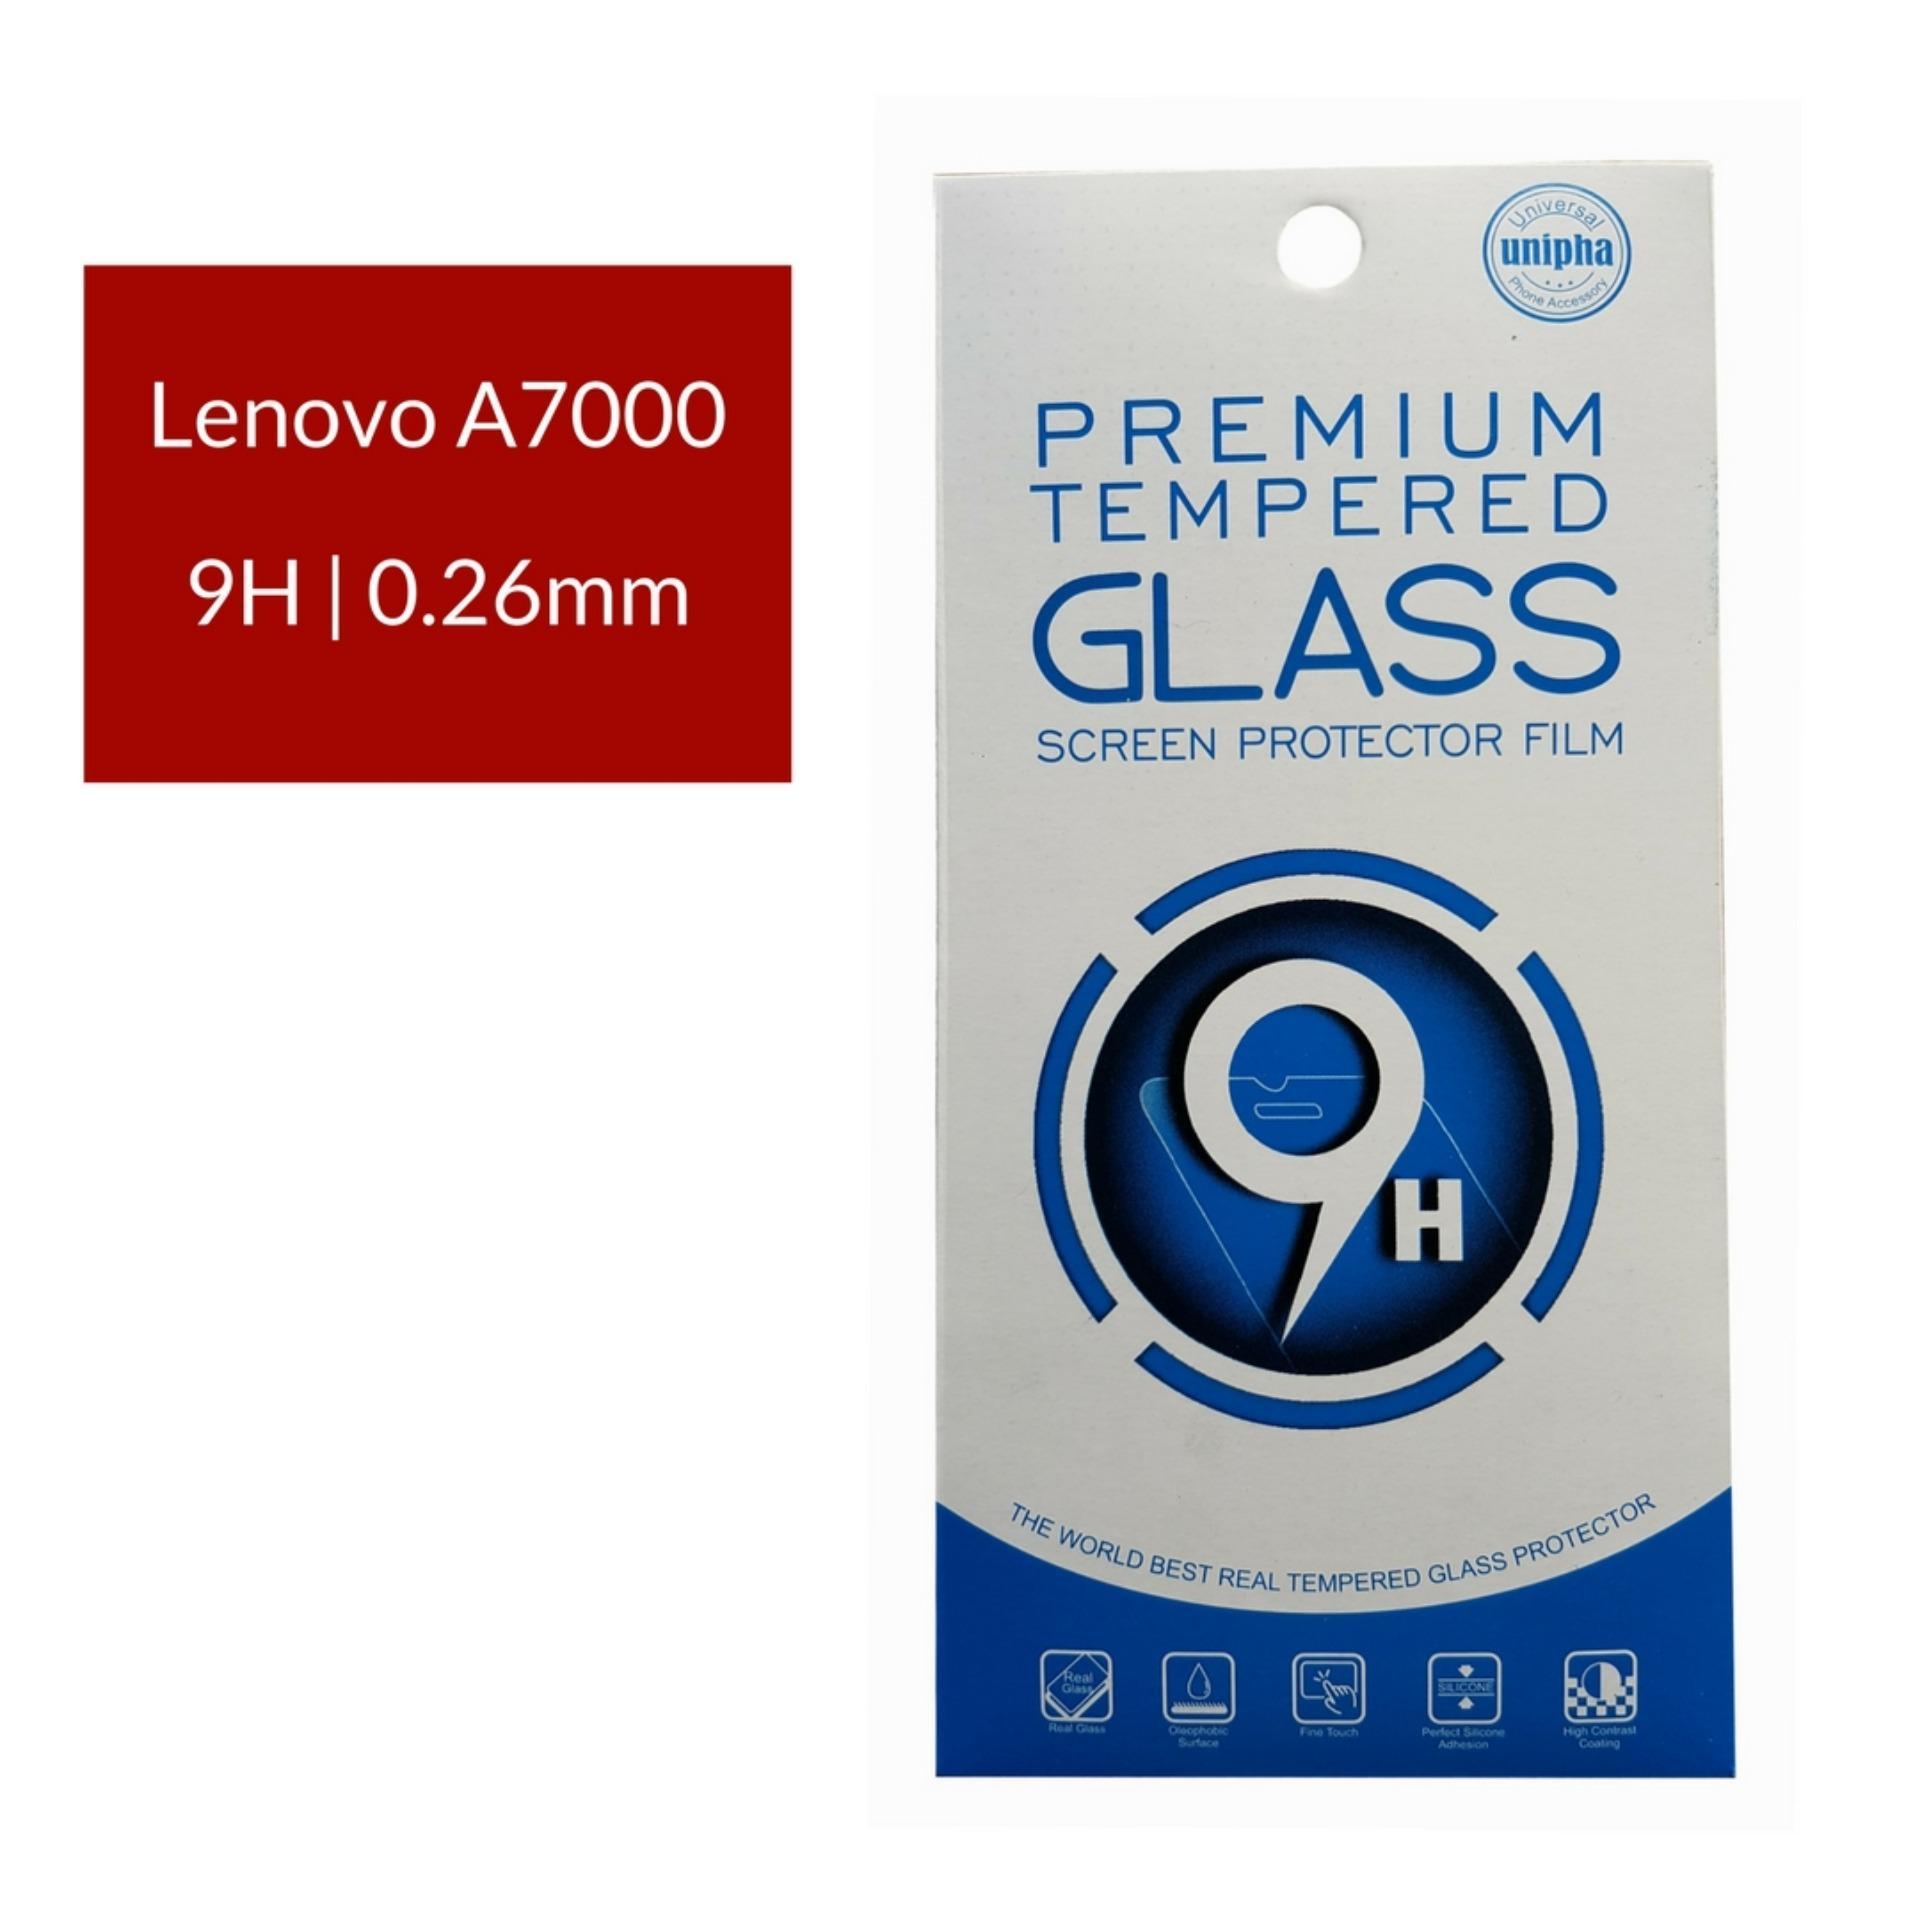 Unipha Premium Tempered Glass Screen Protector / Anti Gores Kaca Lenovo A7000 - Bening